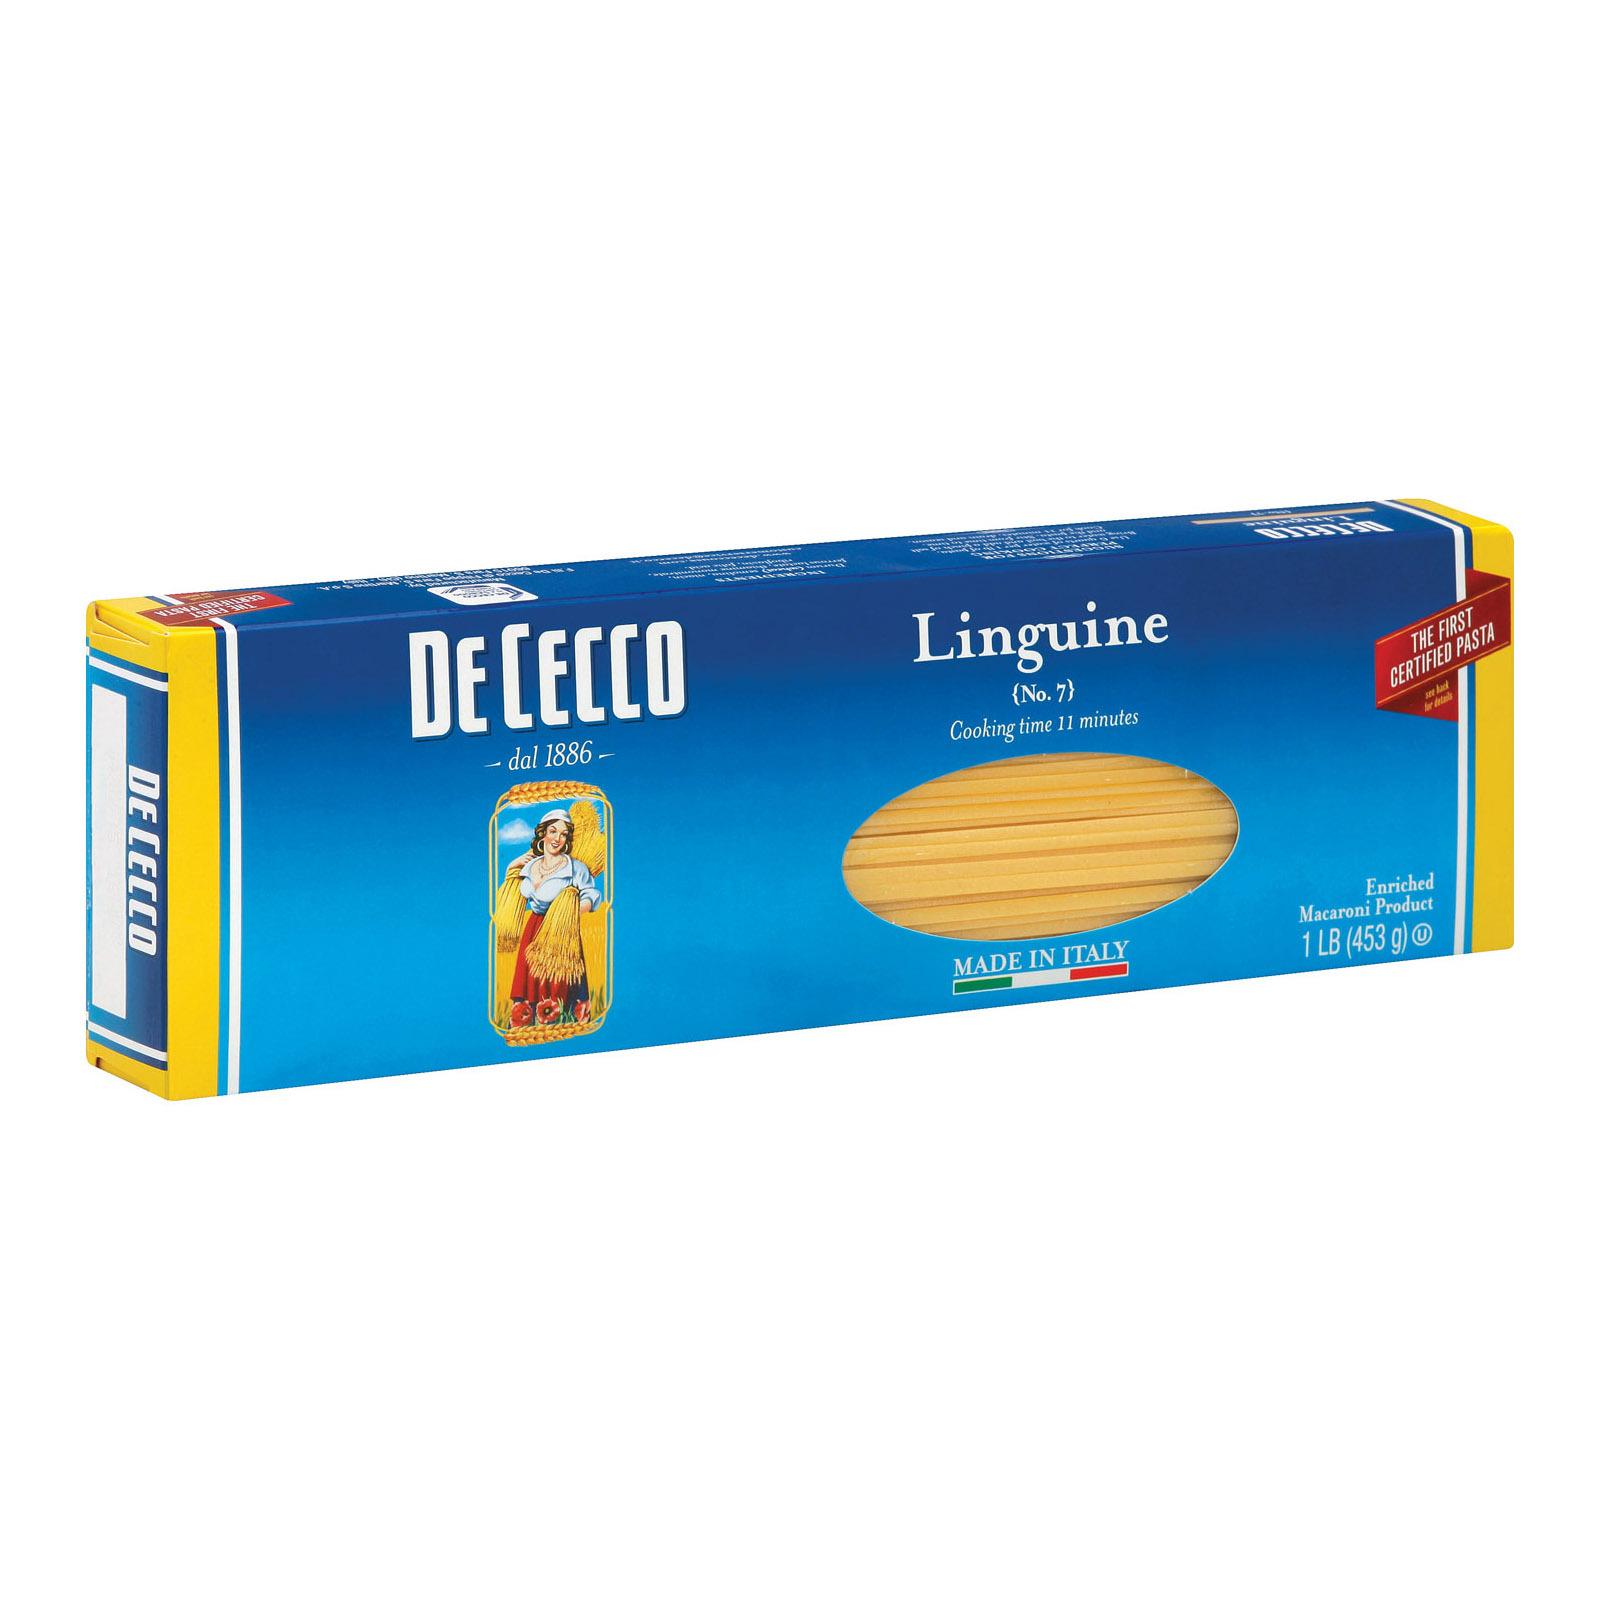 De Cecco Pasta Pasta - Linguine - 16 oz